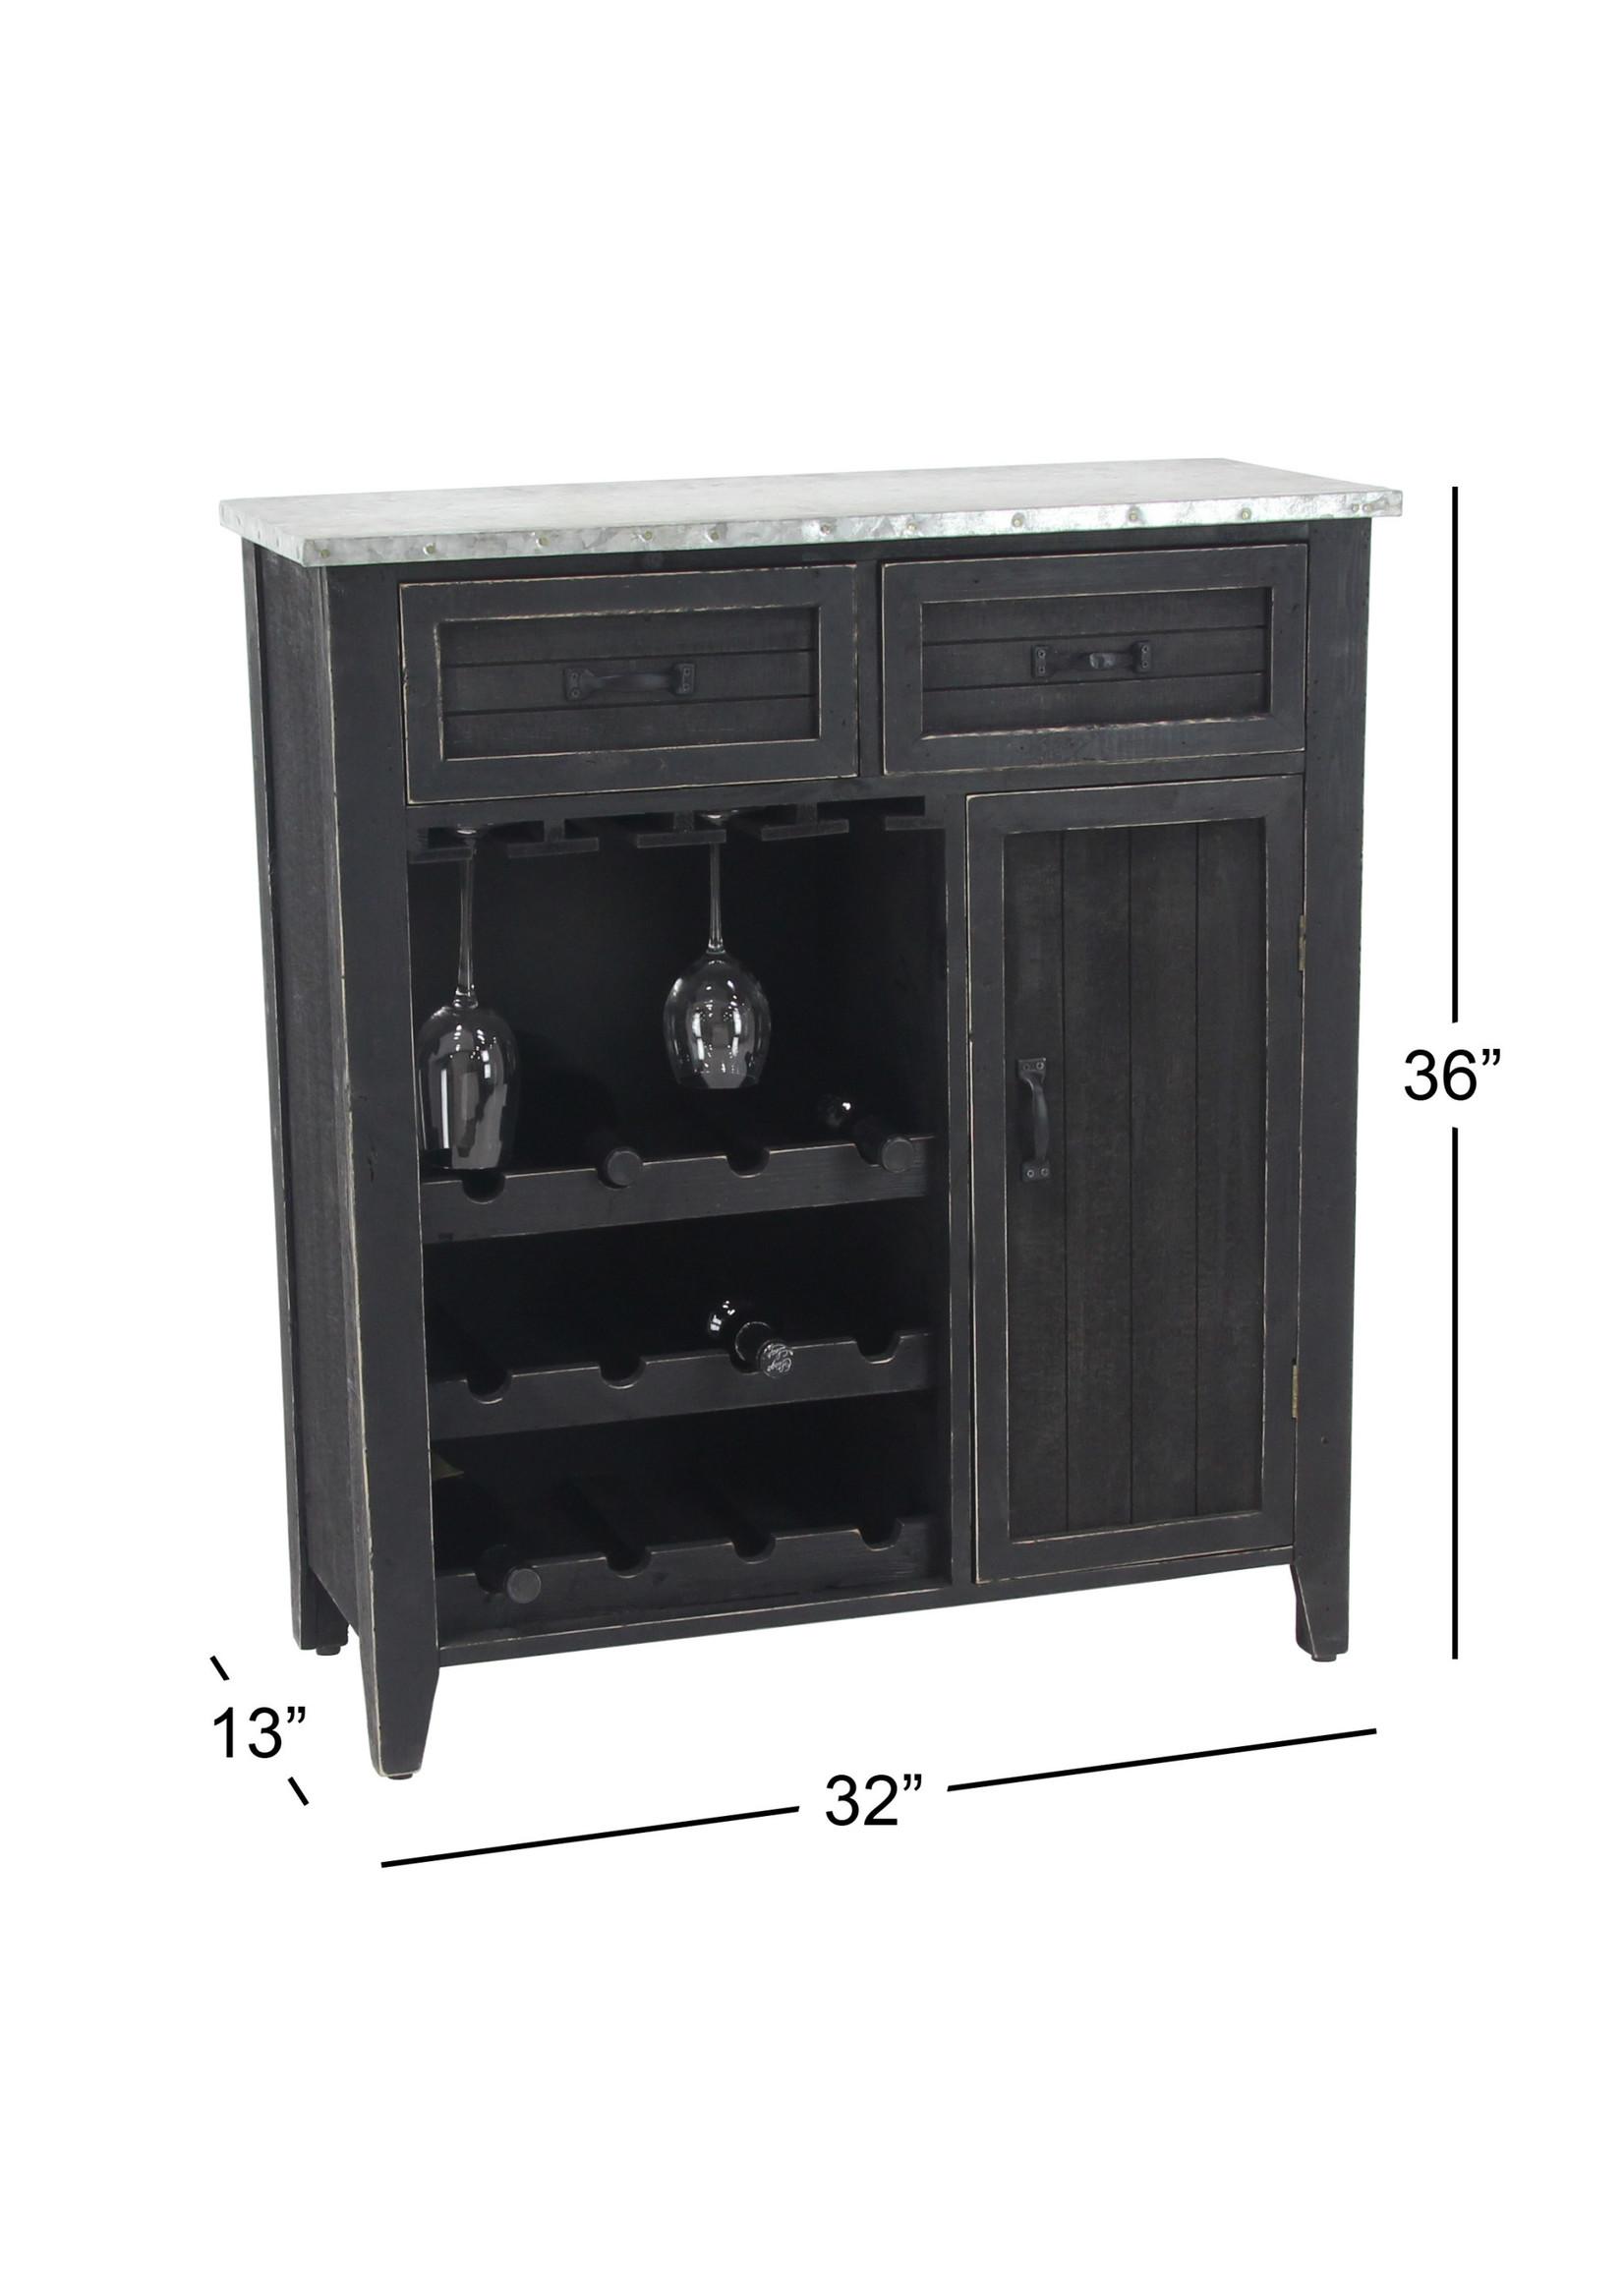 UMA Enterprises Wooden Wine Cabinet